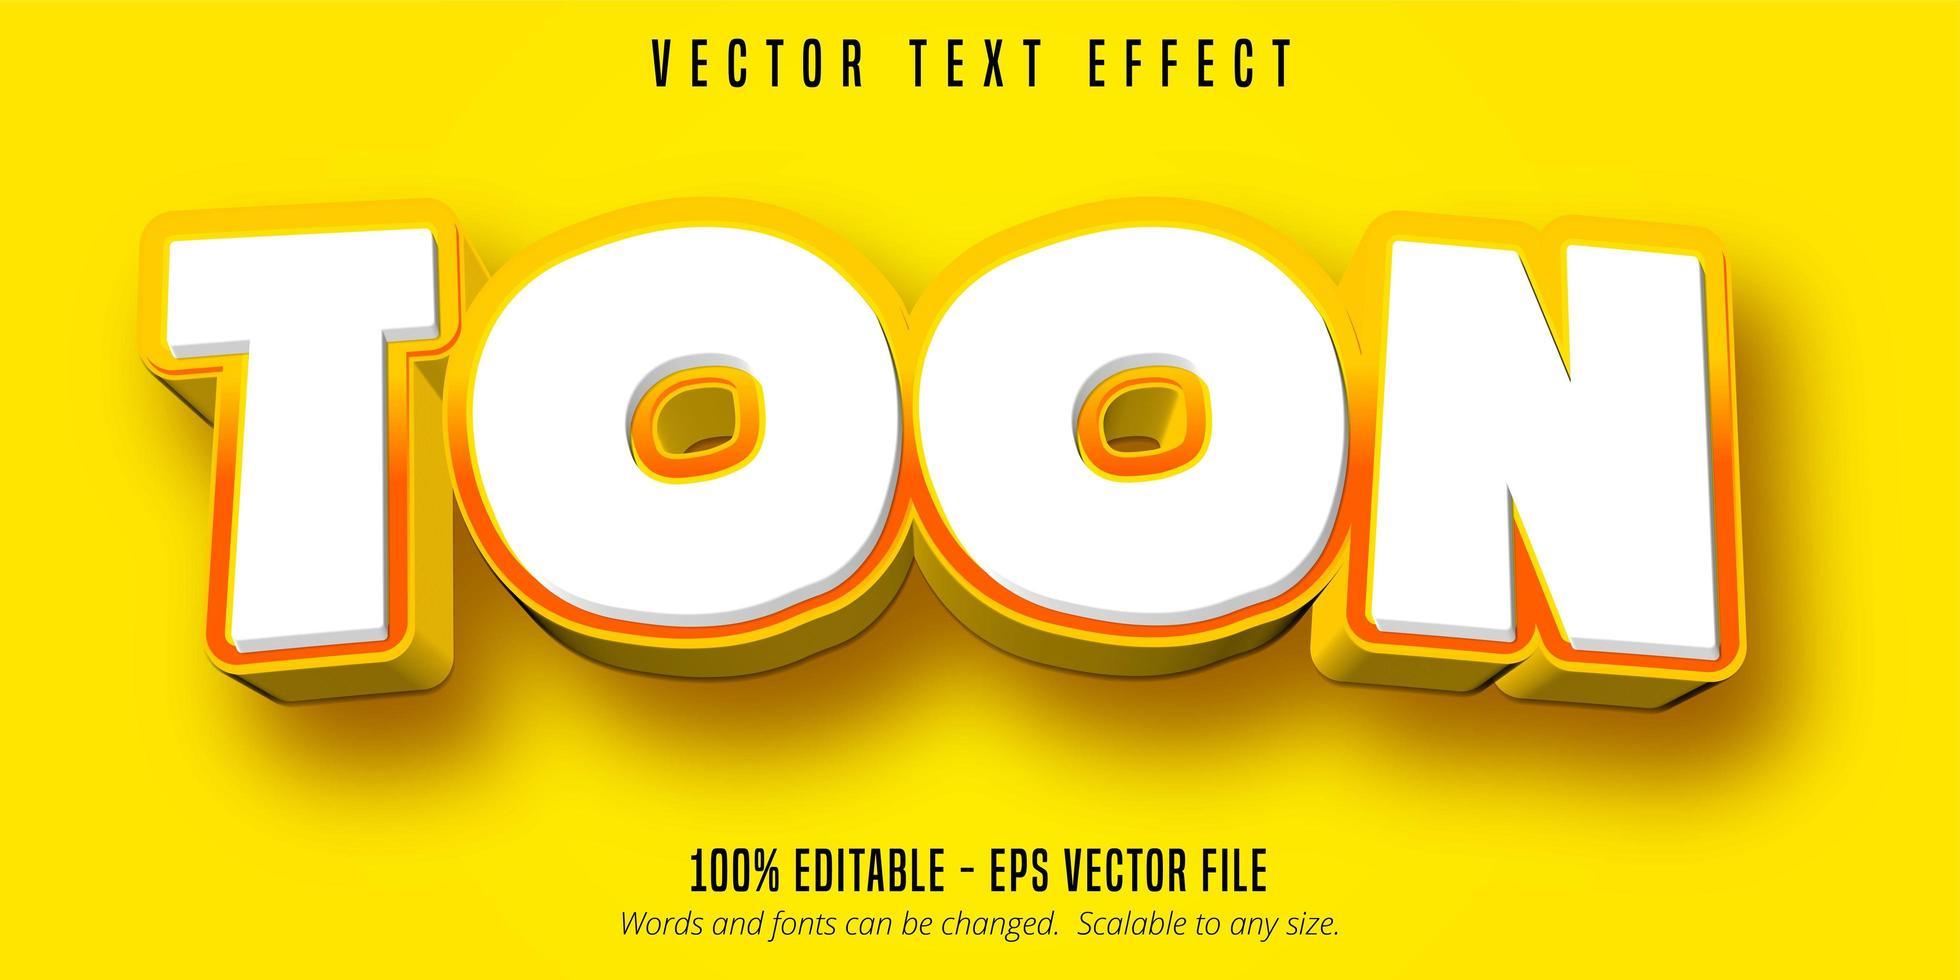 toon tecknad stil redigerbar texteffekt vektor